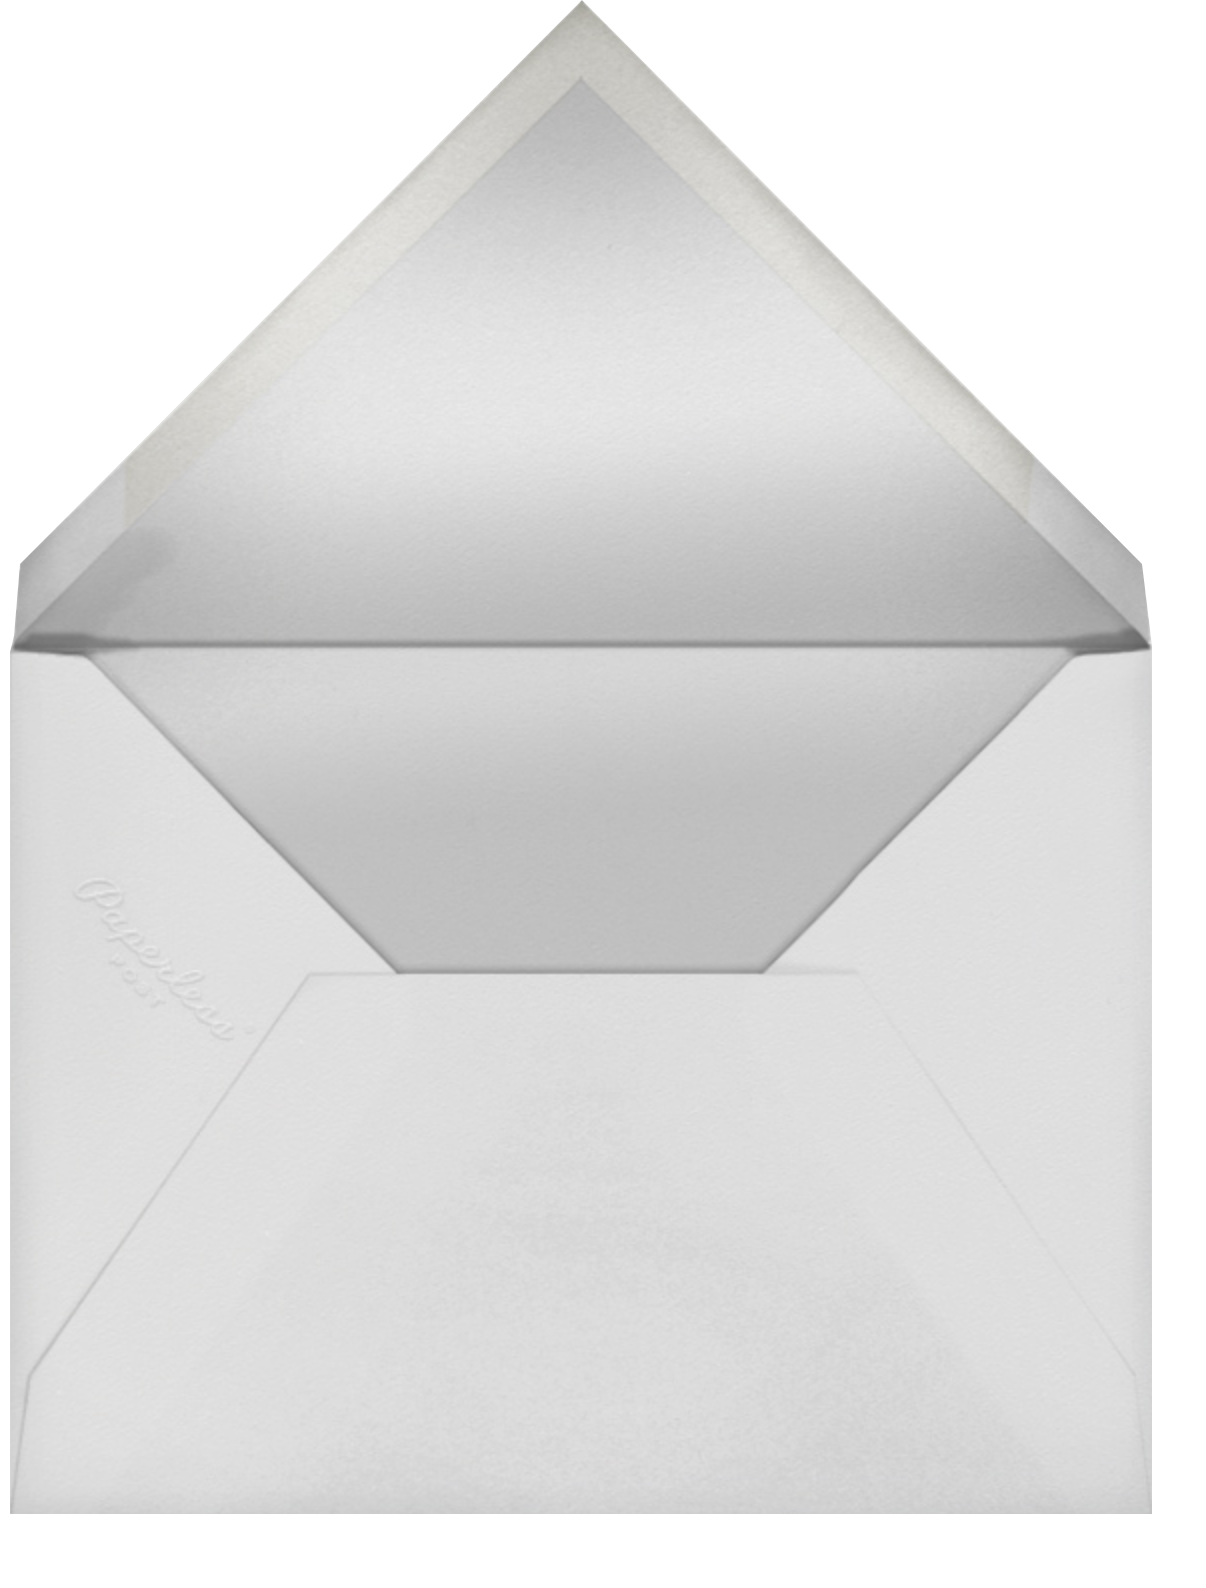 Joie de Vivre (Program) - Paperless Post - Menus and programs - envelope back